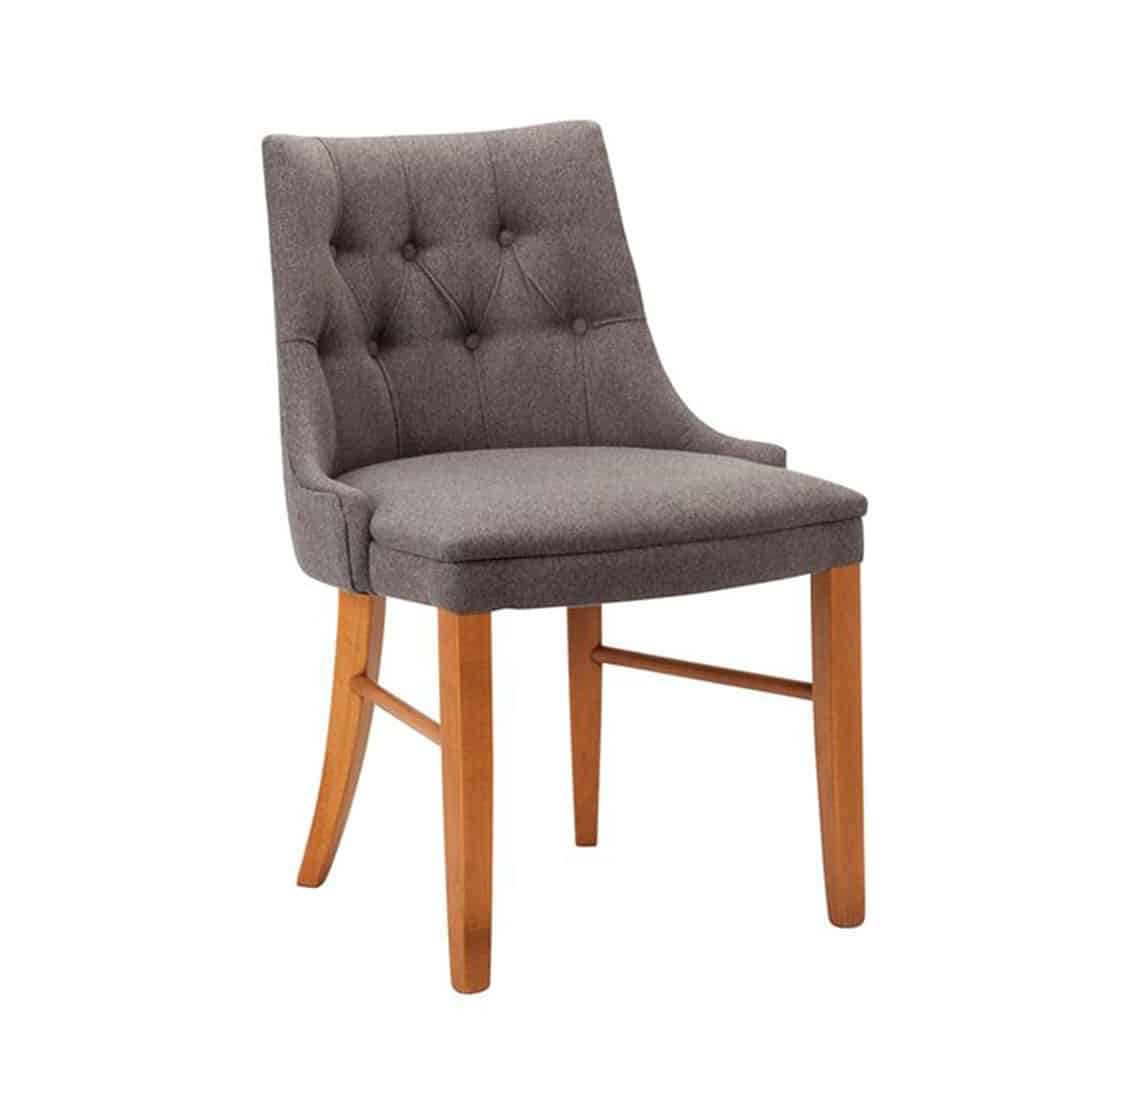 Cortana Deep Button Side Chair DeFrae Contract Furniture